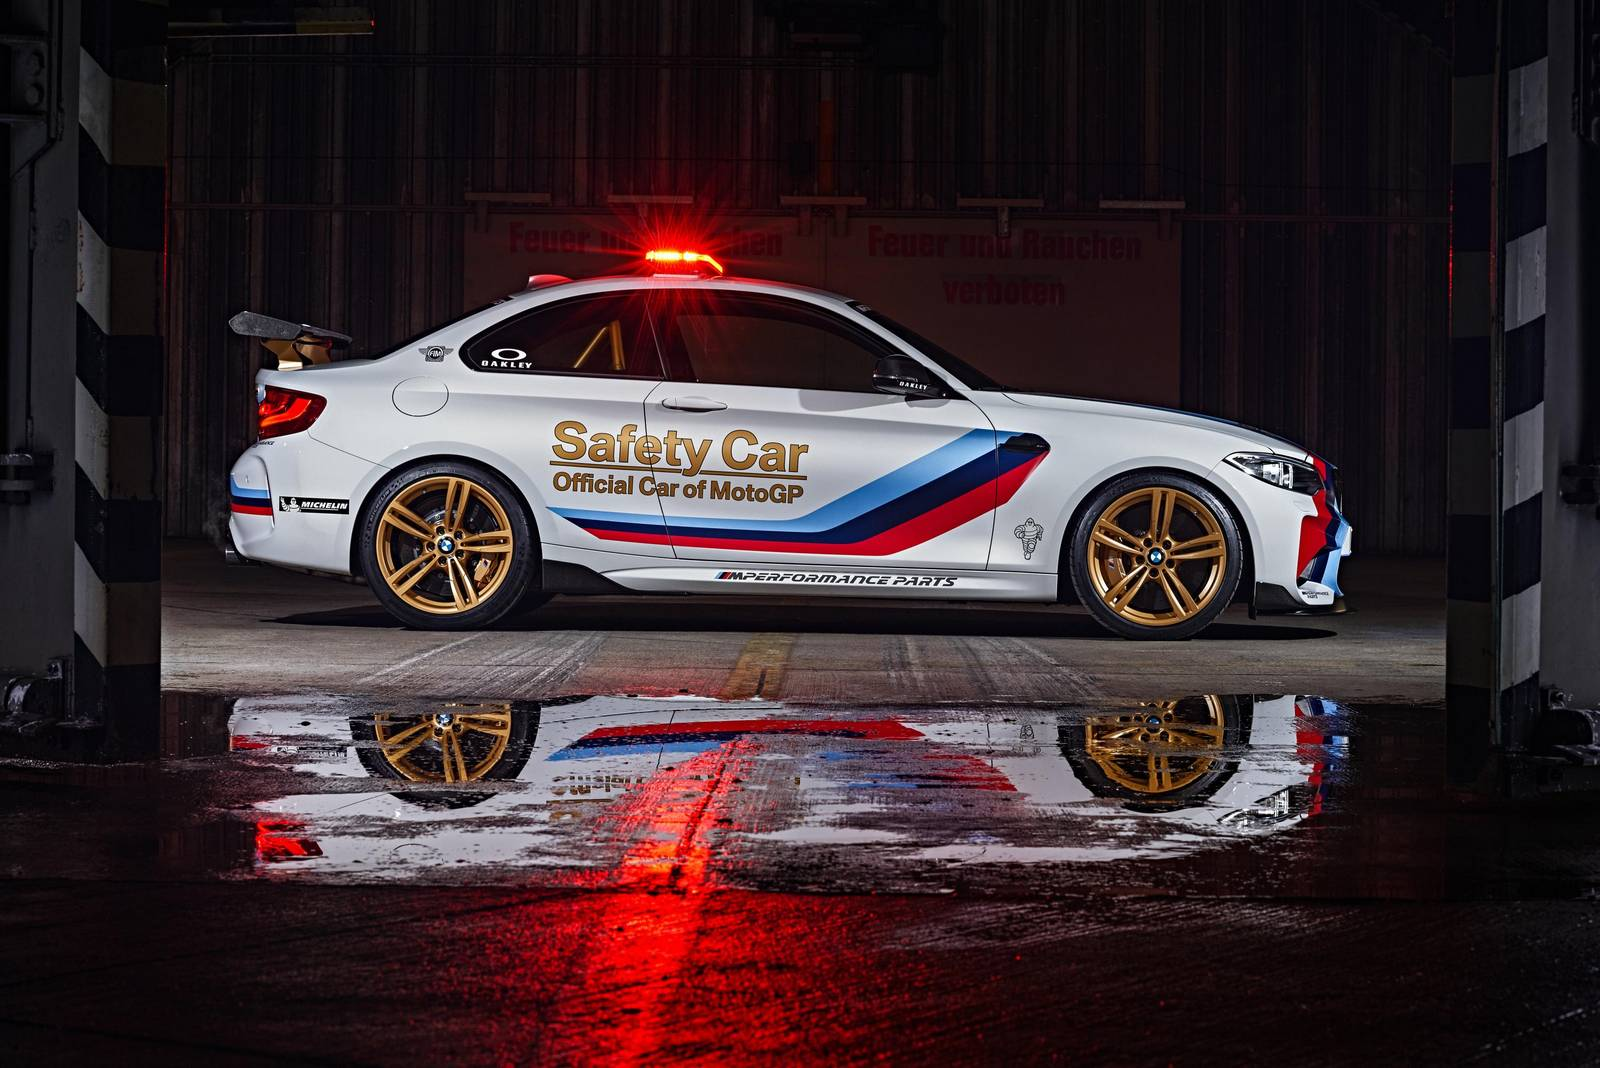 BMW-M2-Safety-Car-MotoGP-2016-autonovosti.me-3